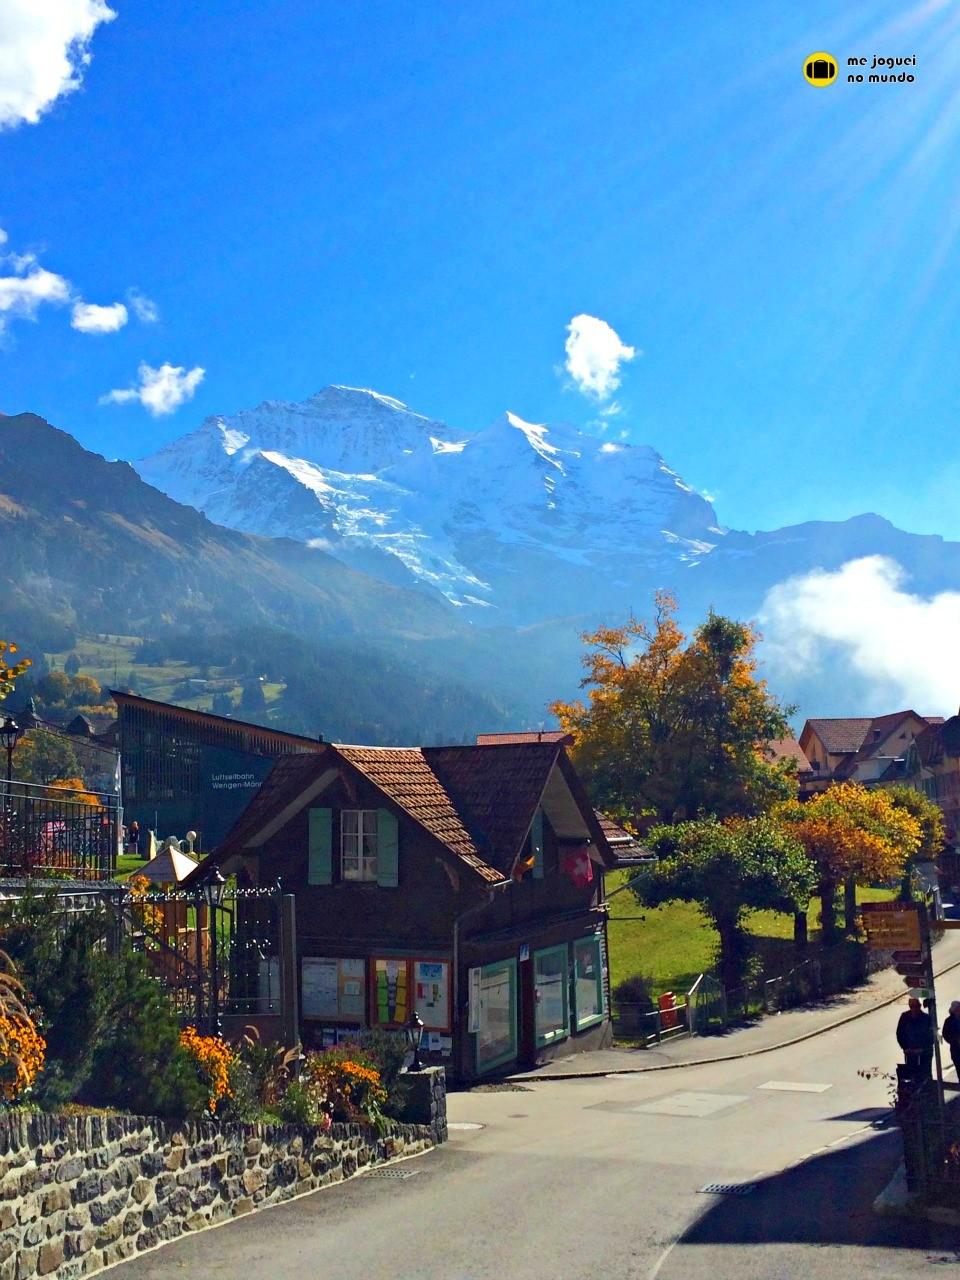 vila sem carros suiça wengen